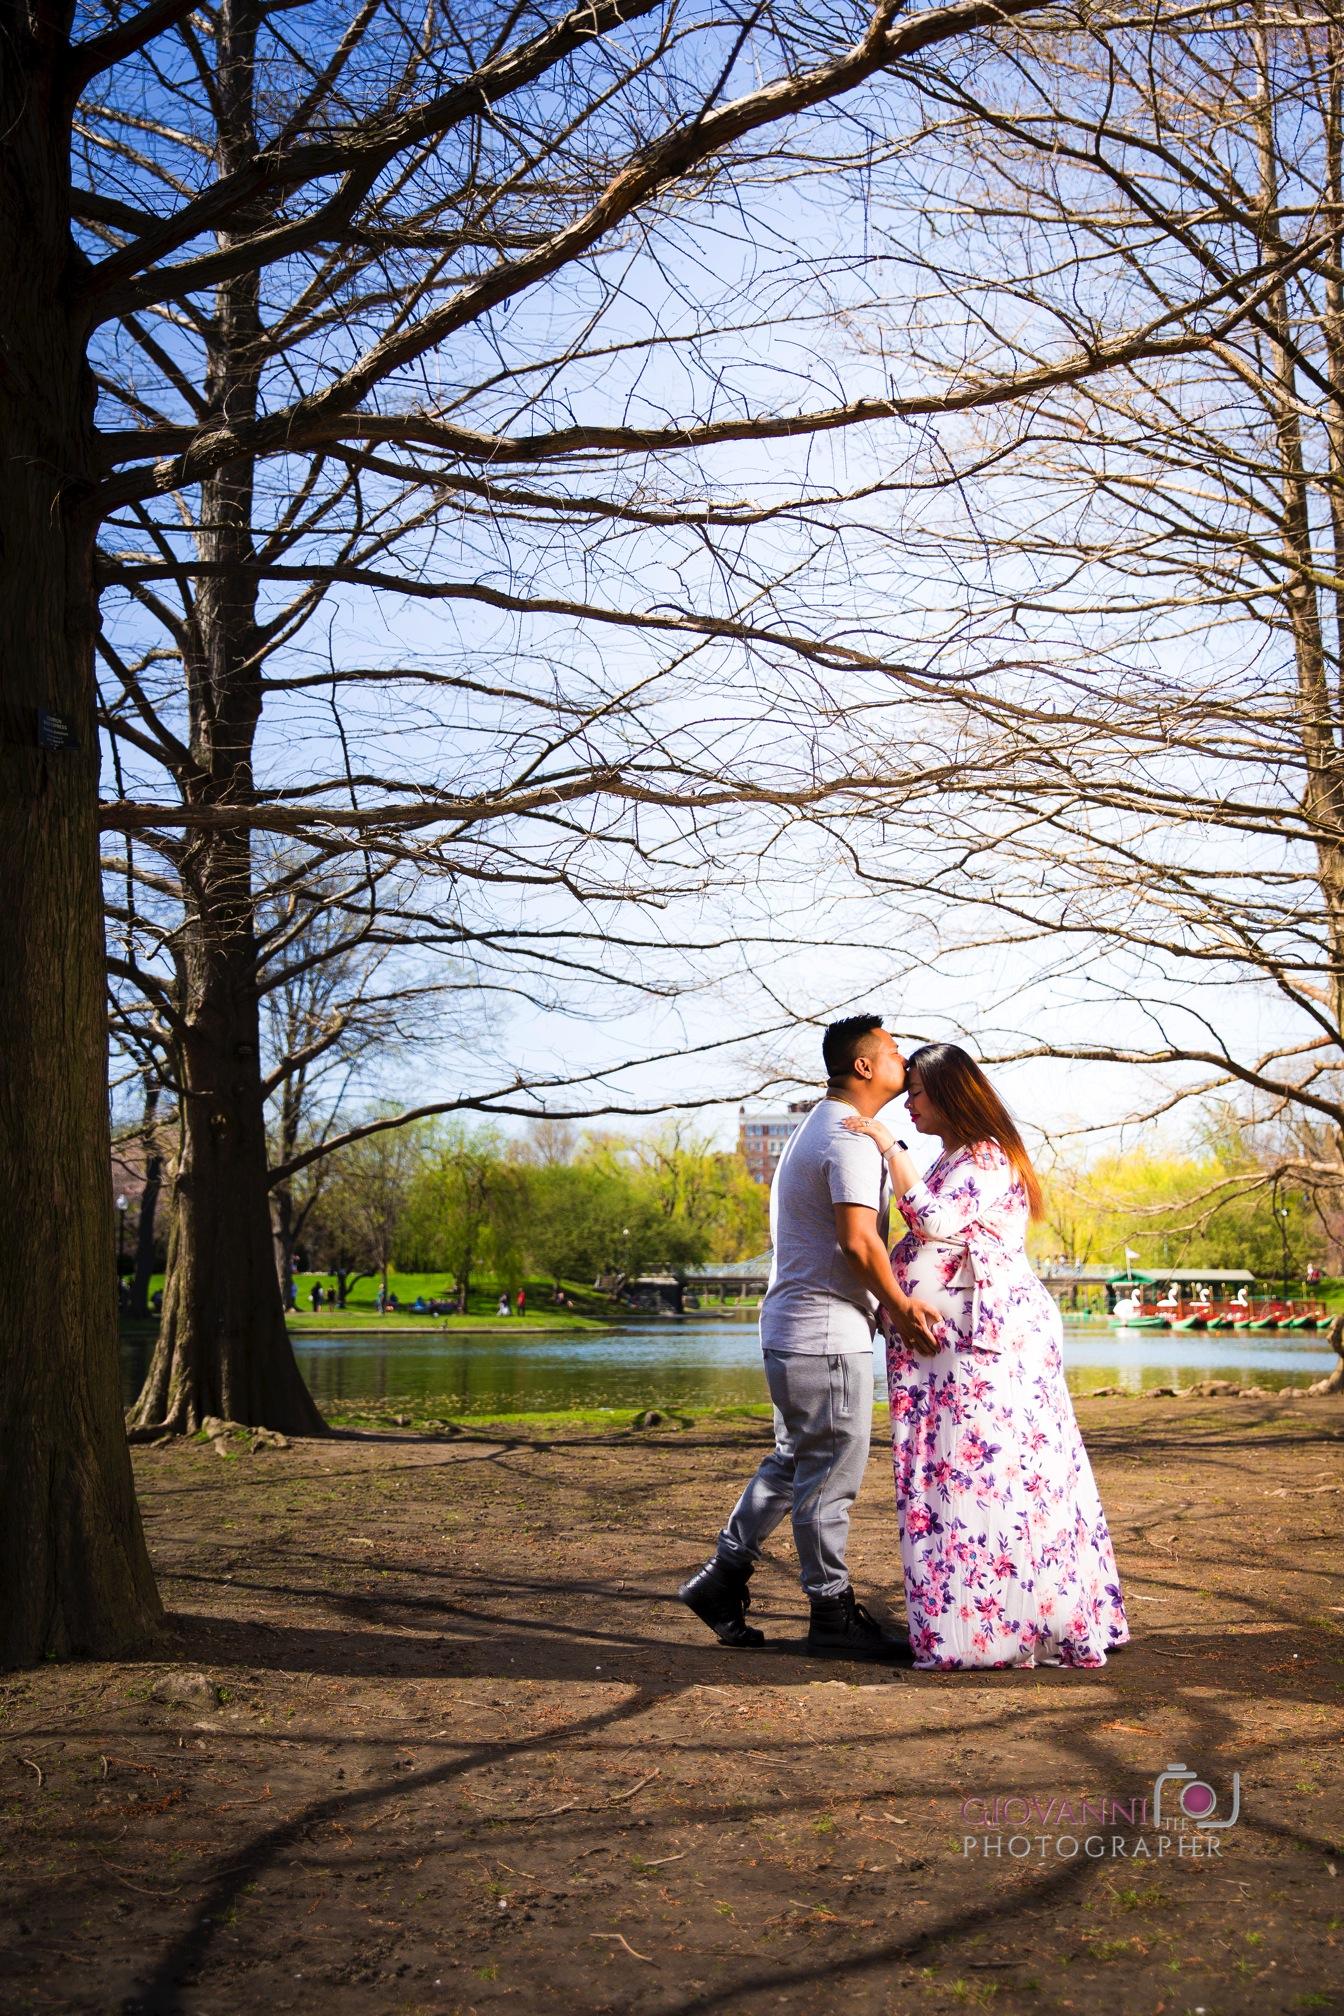 8C2A5918 Giovanni The Photographer Boston Engagement - Maternity - Newborn Photography Vikrant & Rtunasnet WM 35.jpg